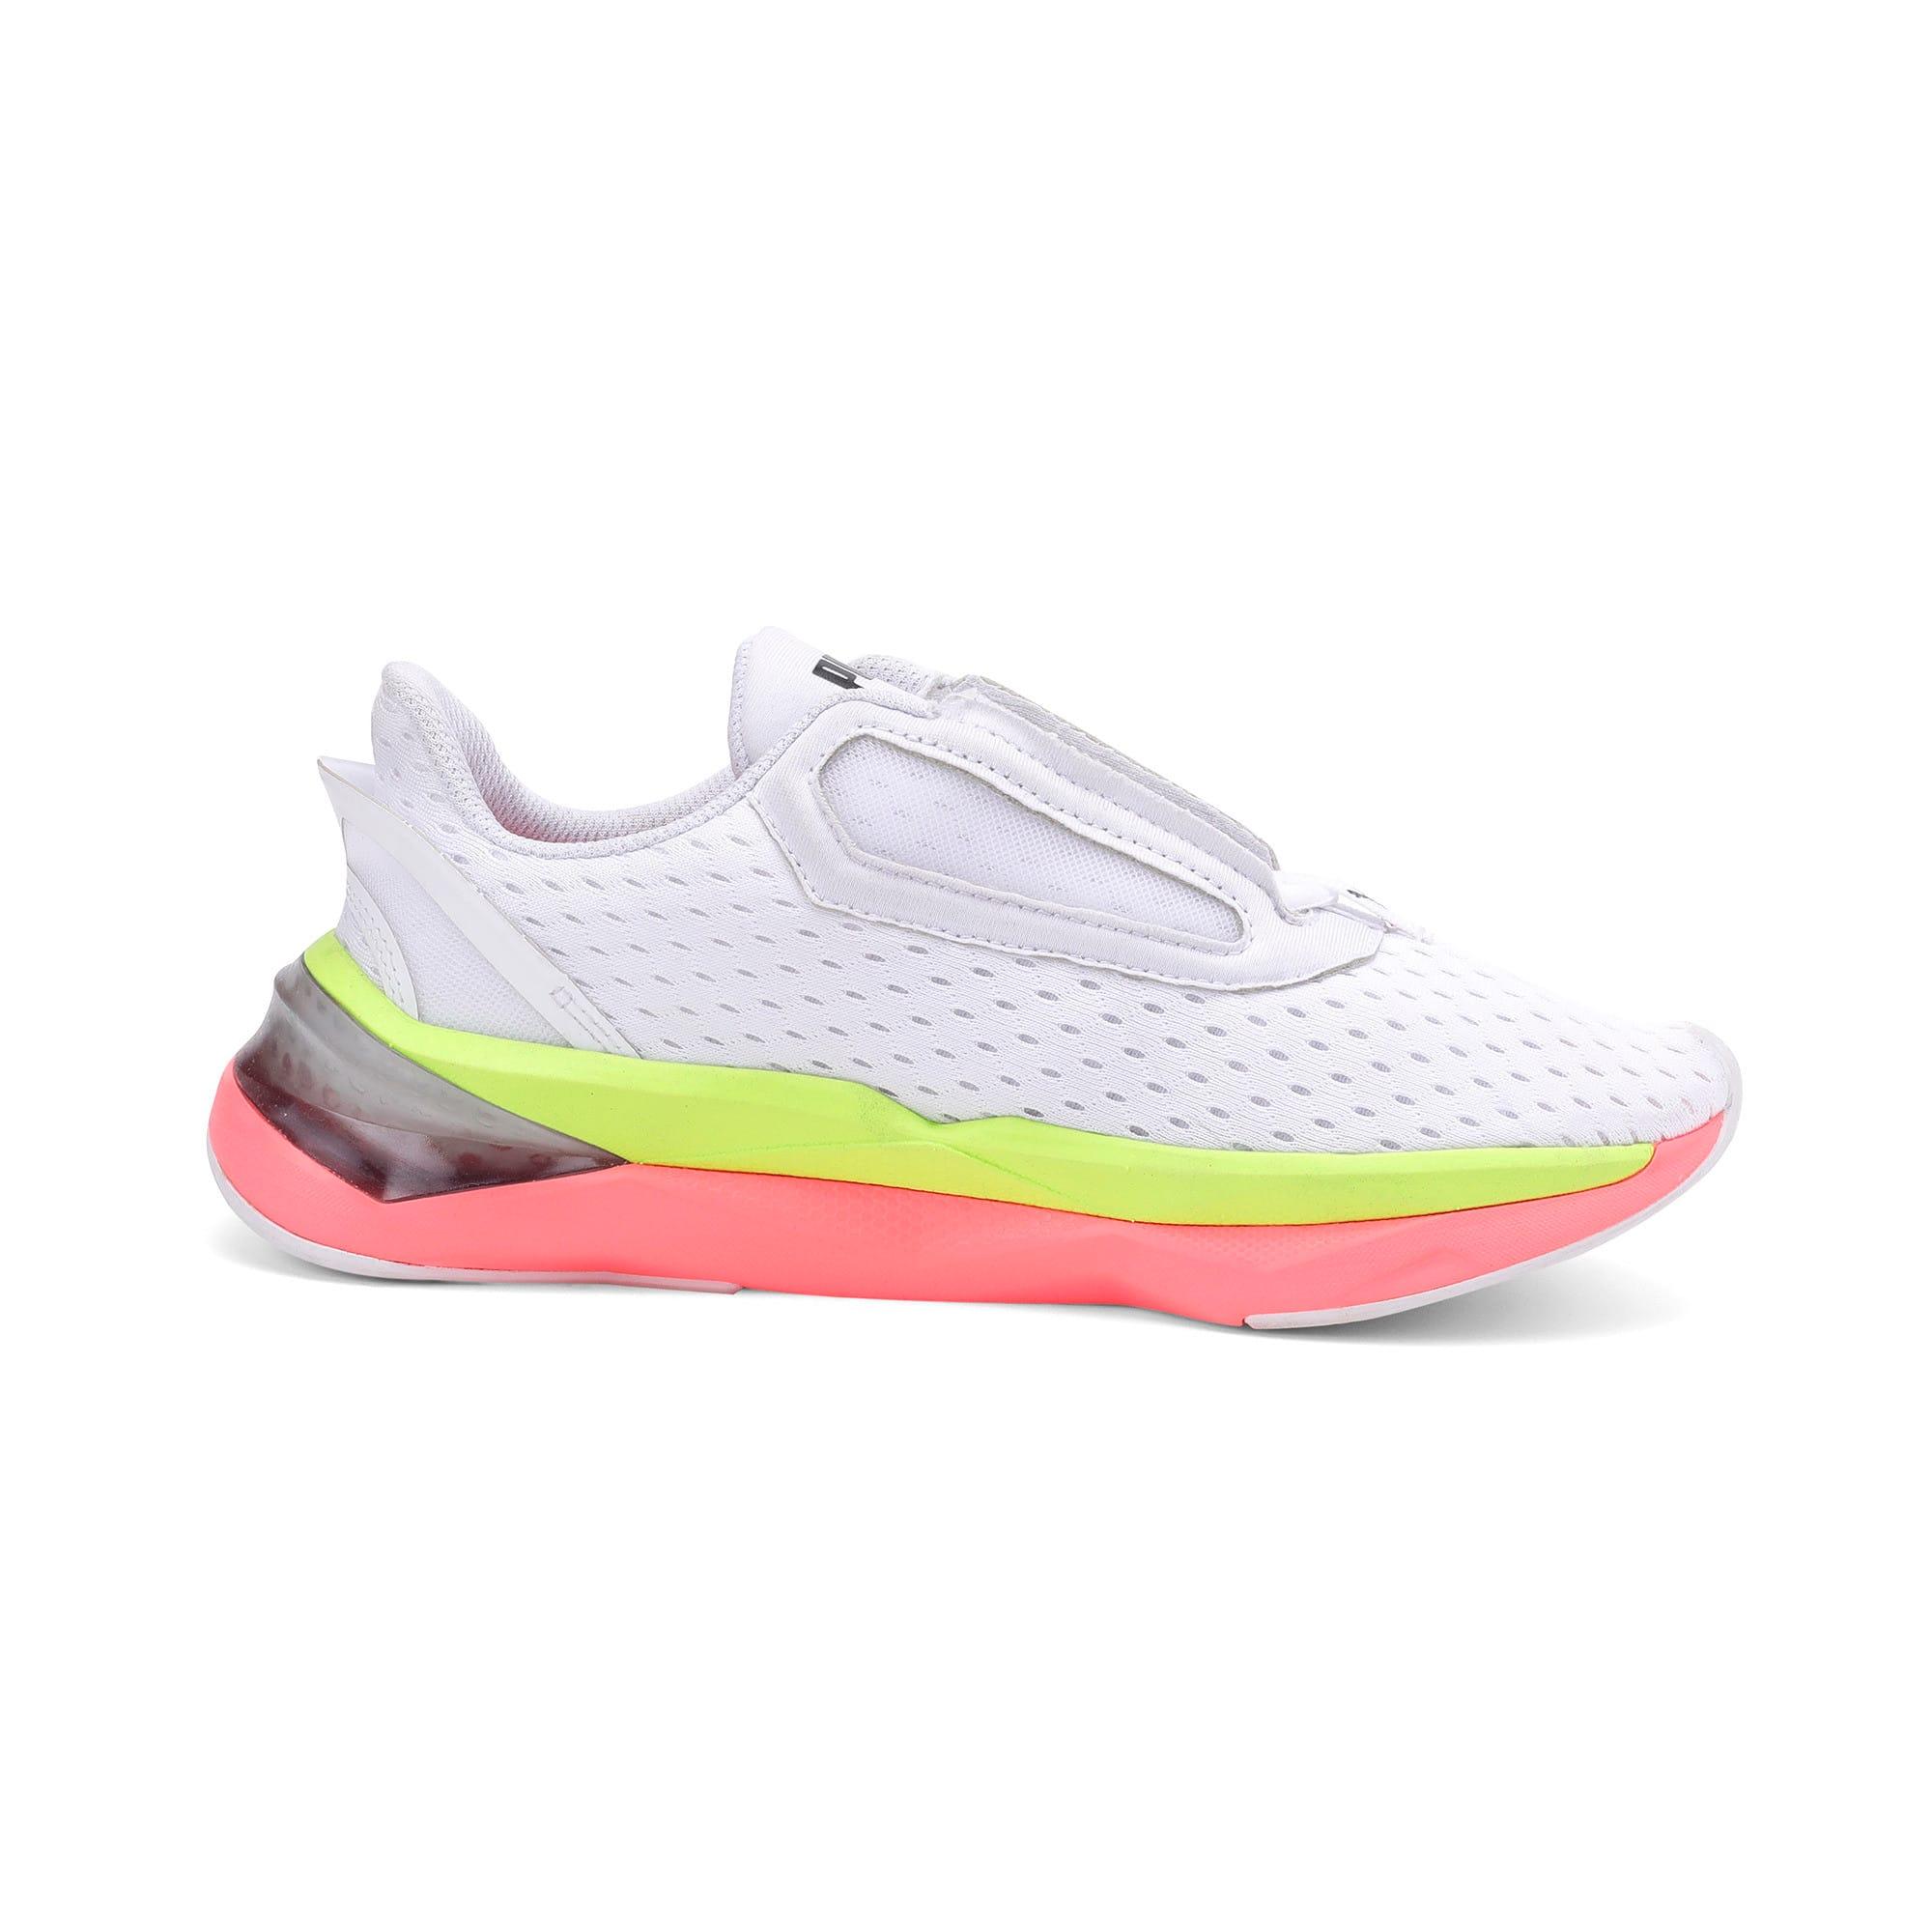 Thumbnail 8 of LQDCell Shatter XT Women's Training Shoes, Puma White-Pink Alert, medium-IND